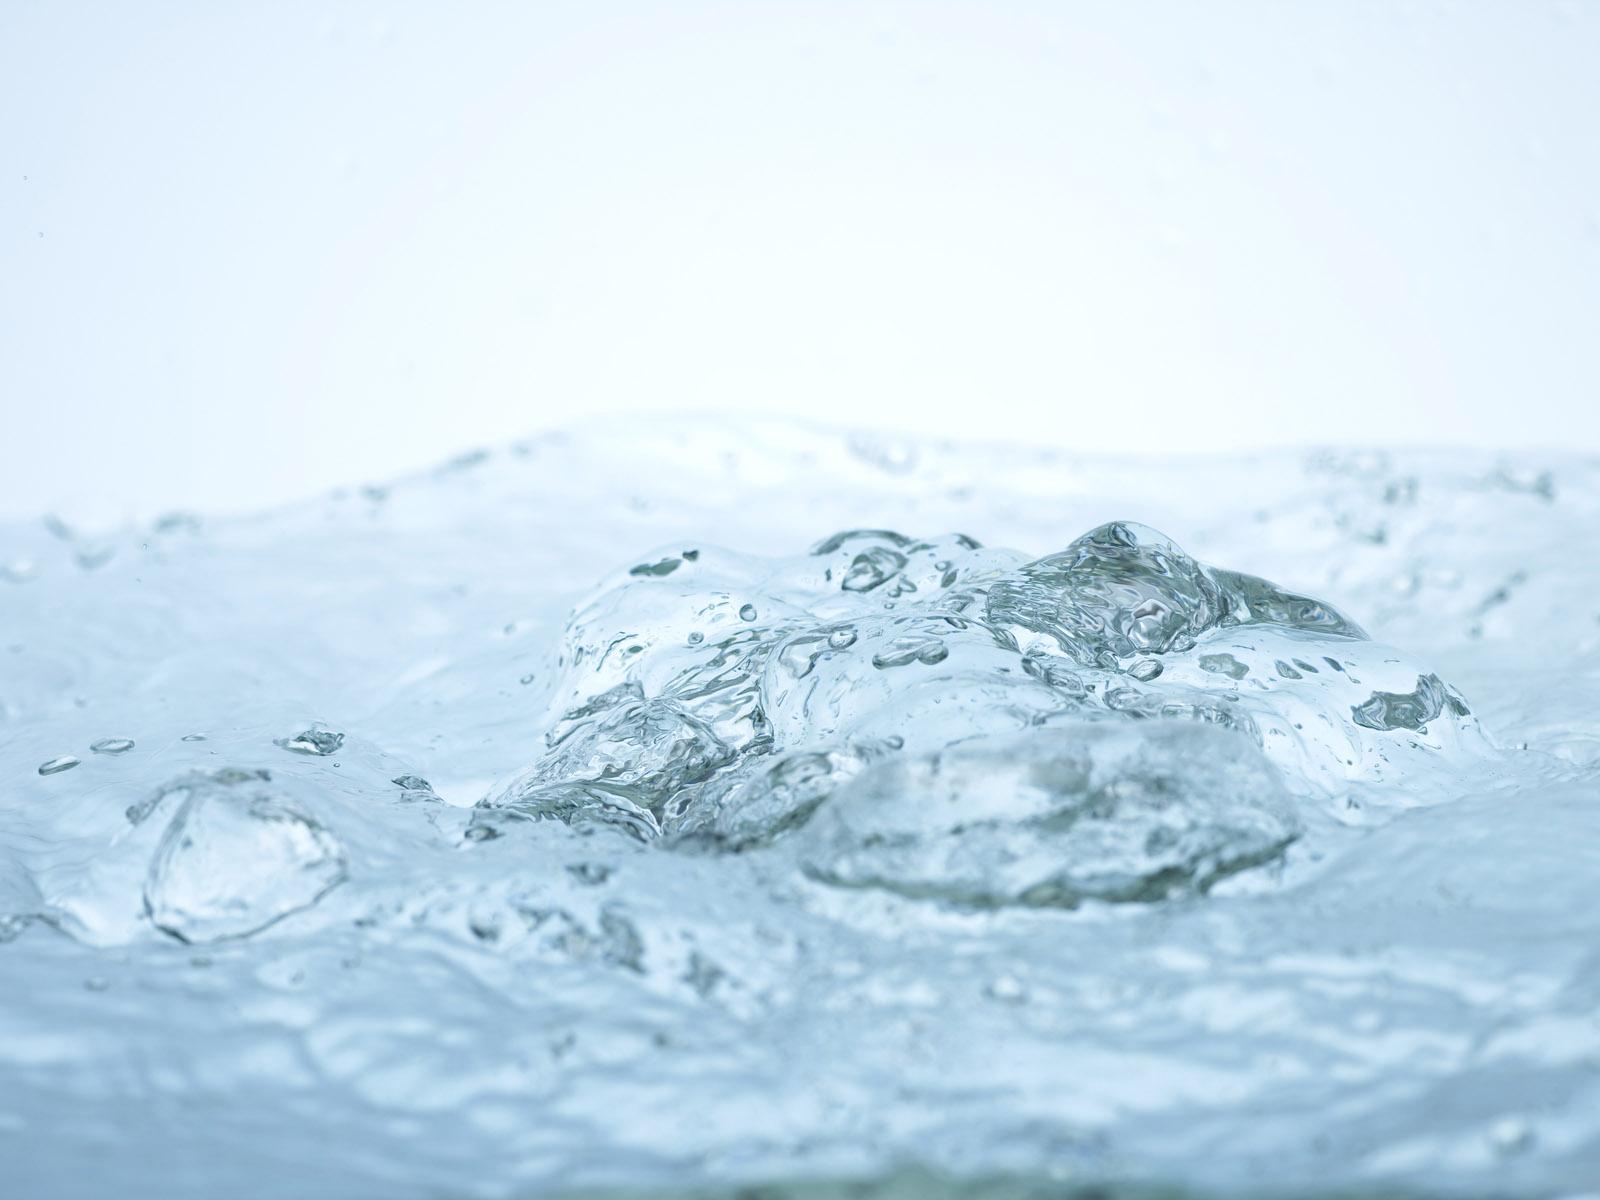 Elemental Water White 1600x1200